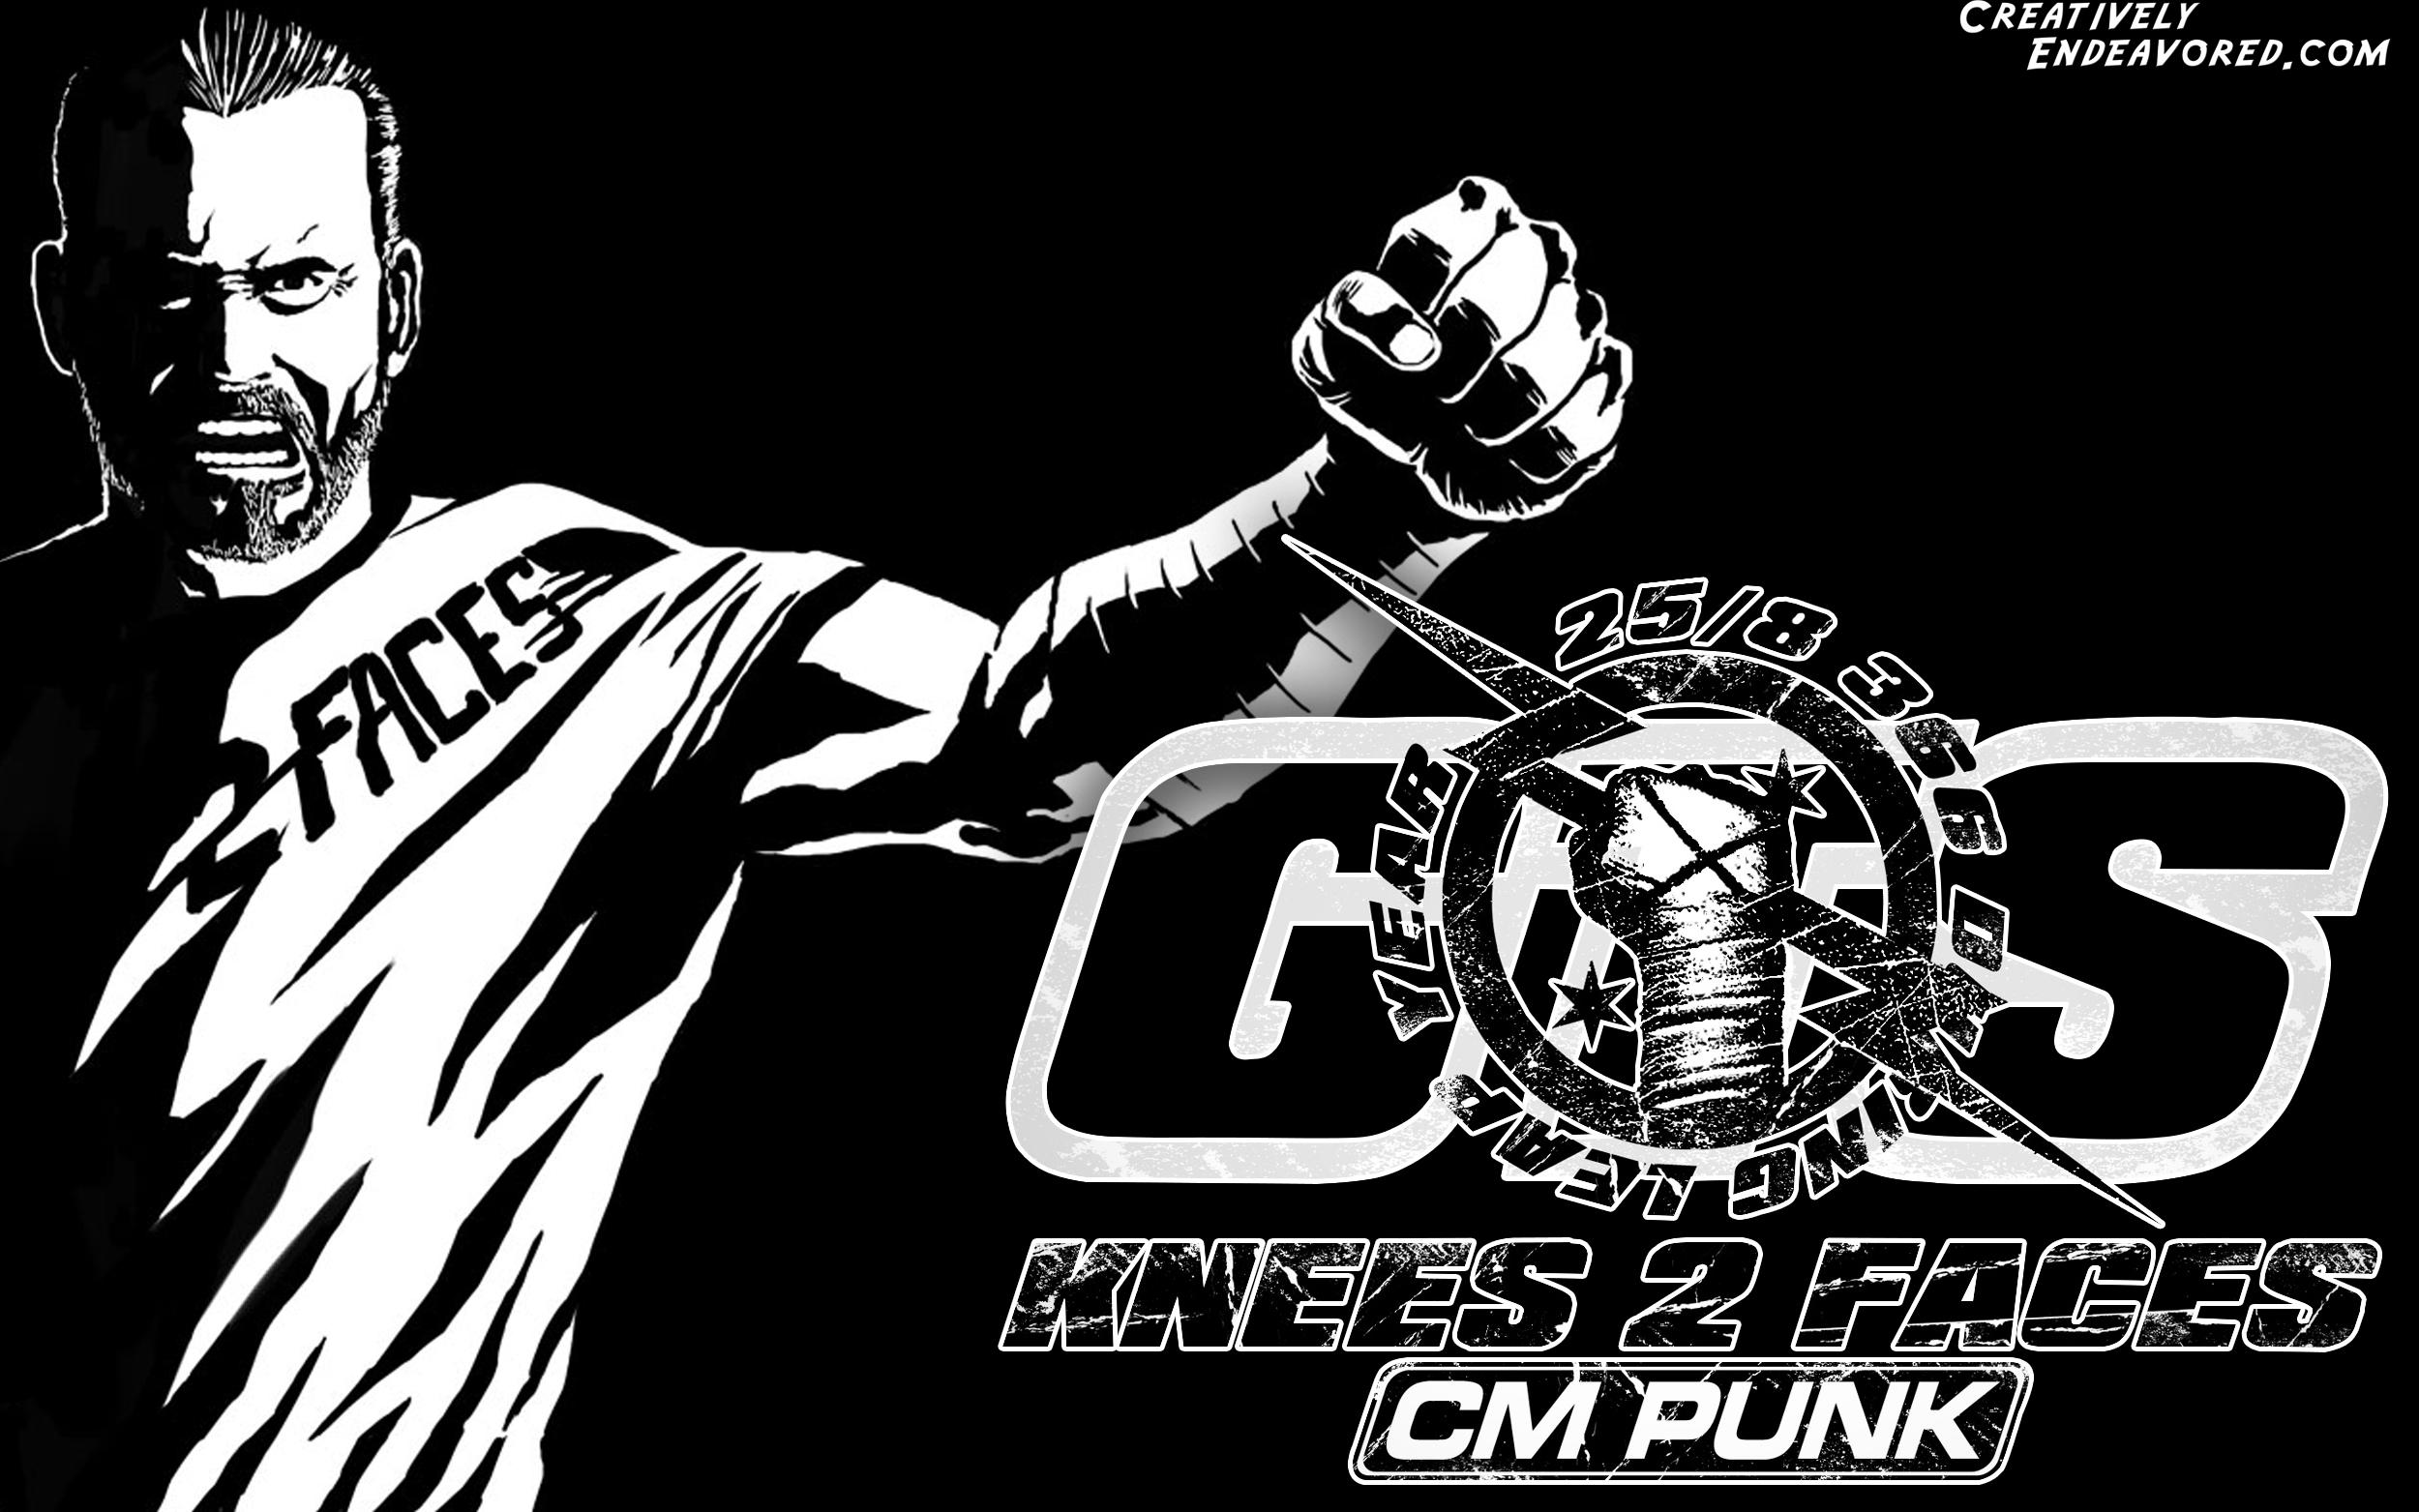 Wallpaper Wednesday CM Punk Its Clobberin Time 2500x1563